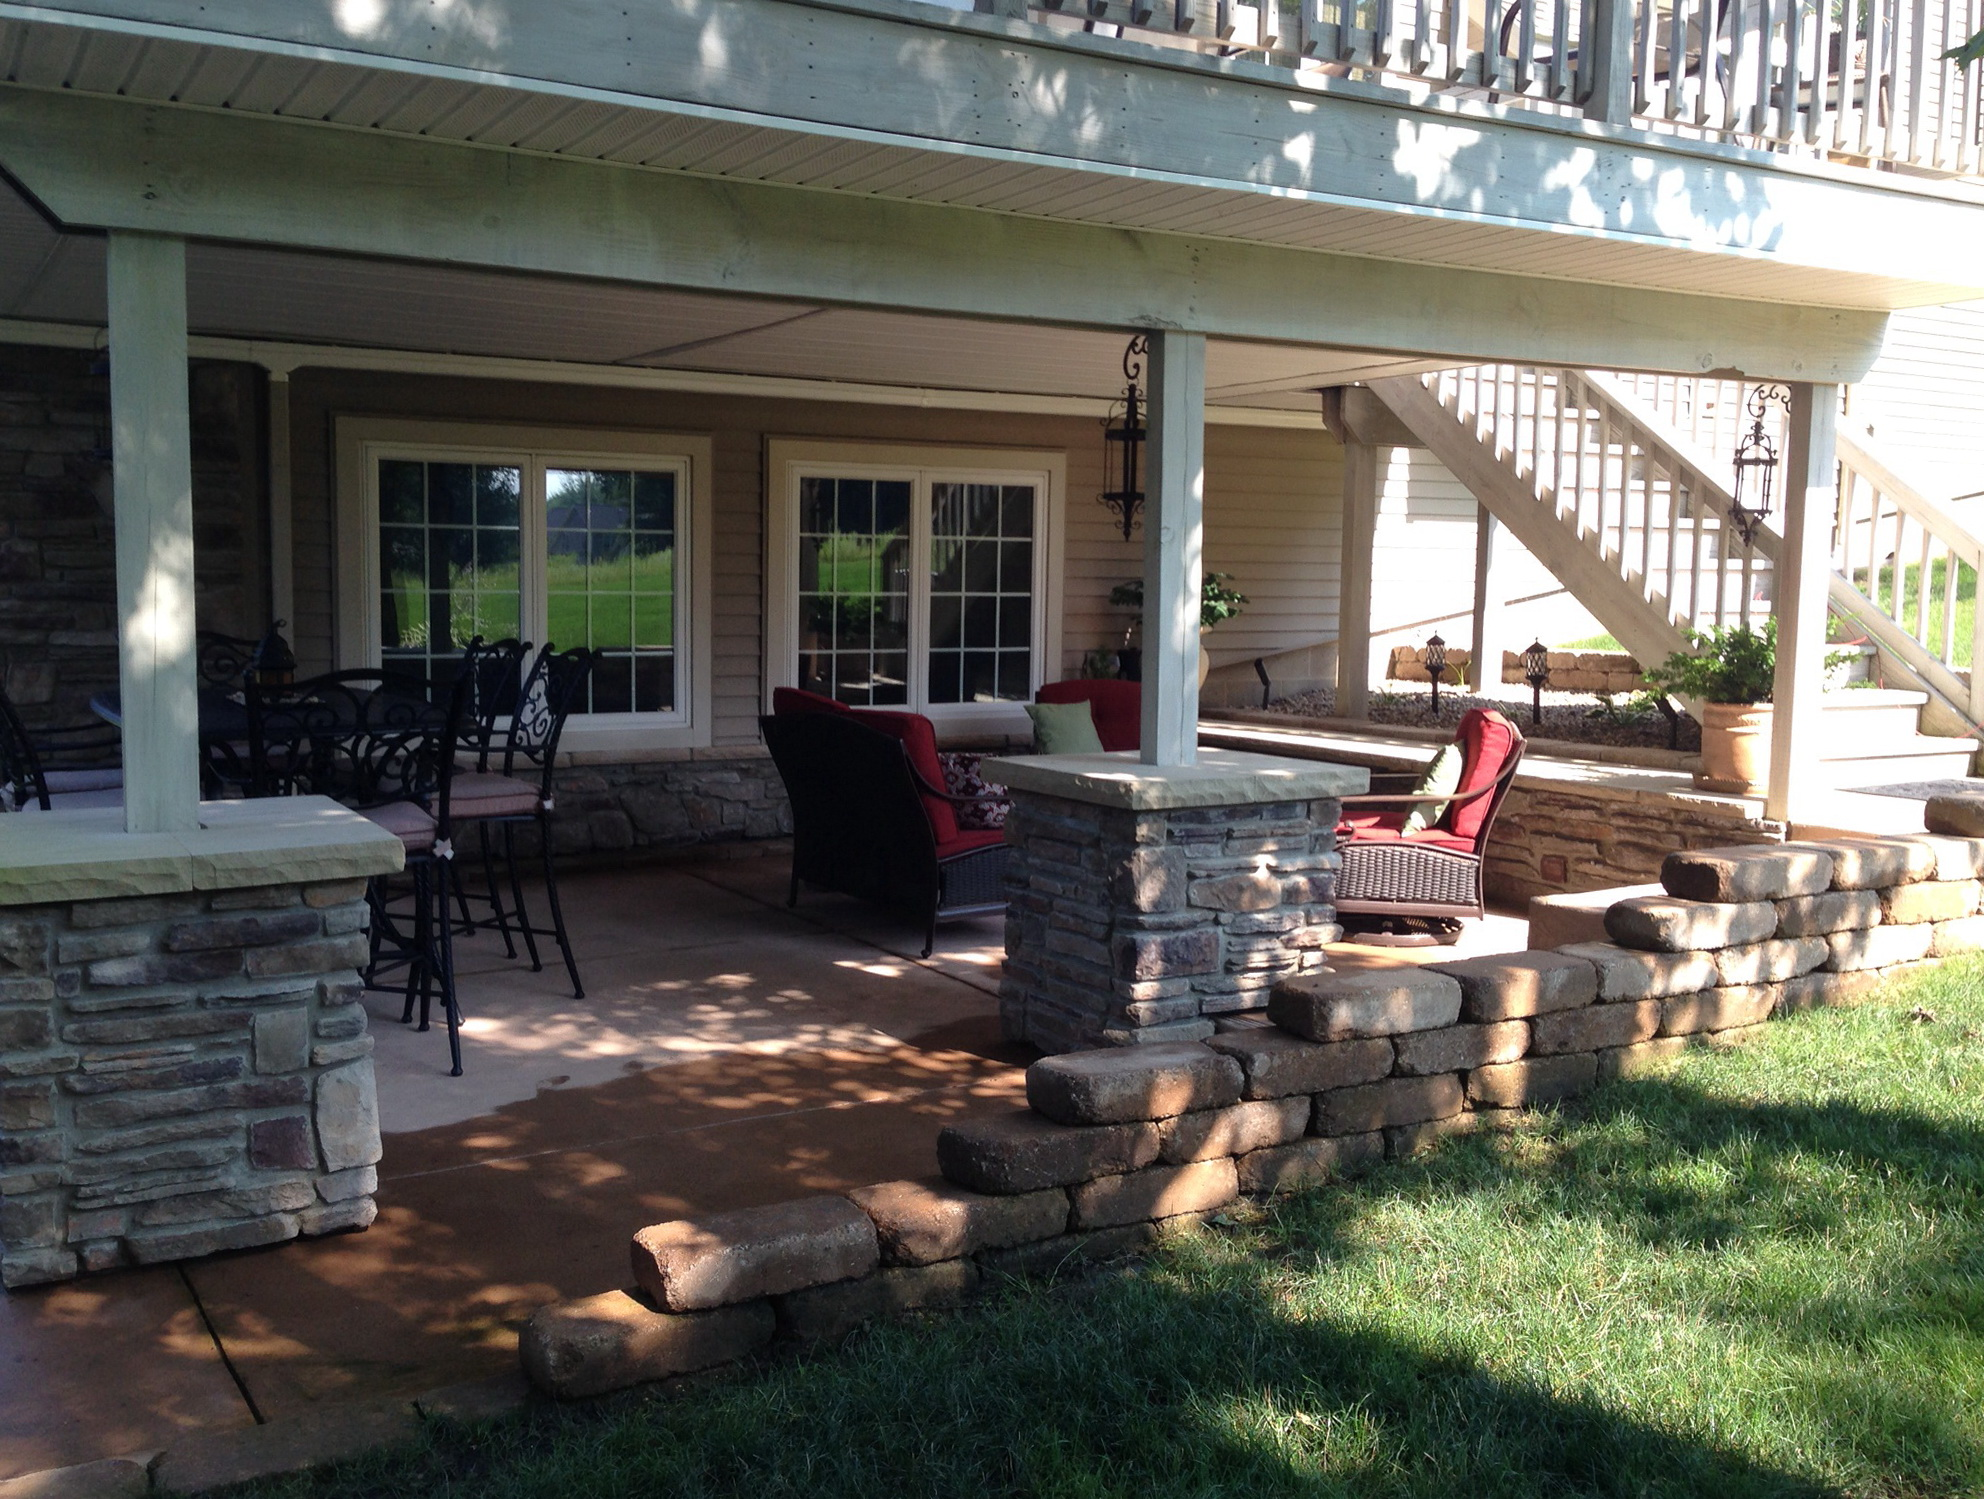 Patio Under Deck Design Ideas | Home Design Ideas on Patio With Deck Ideas id=71045